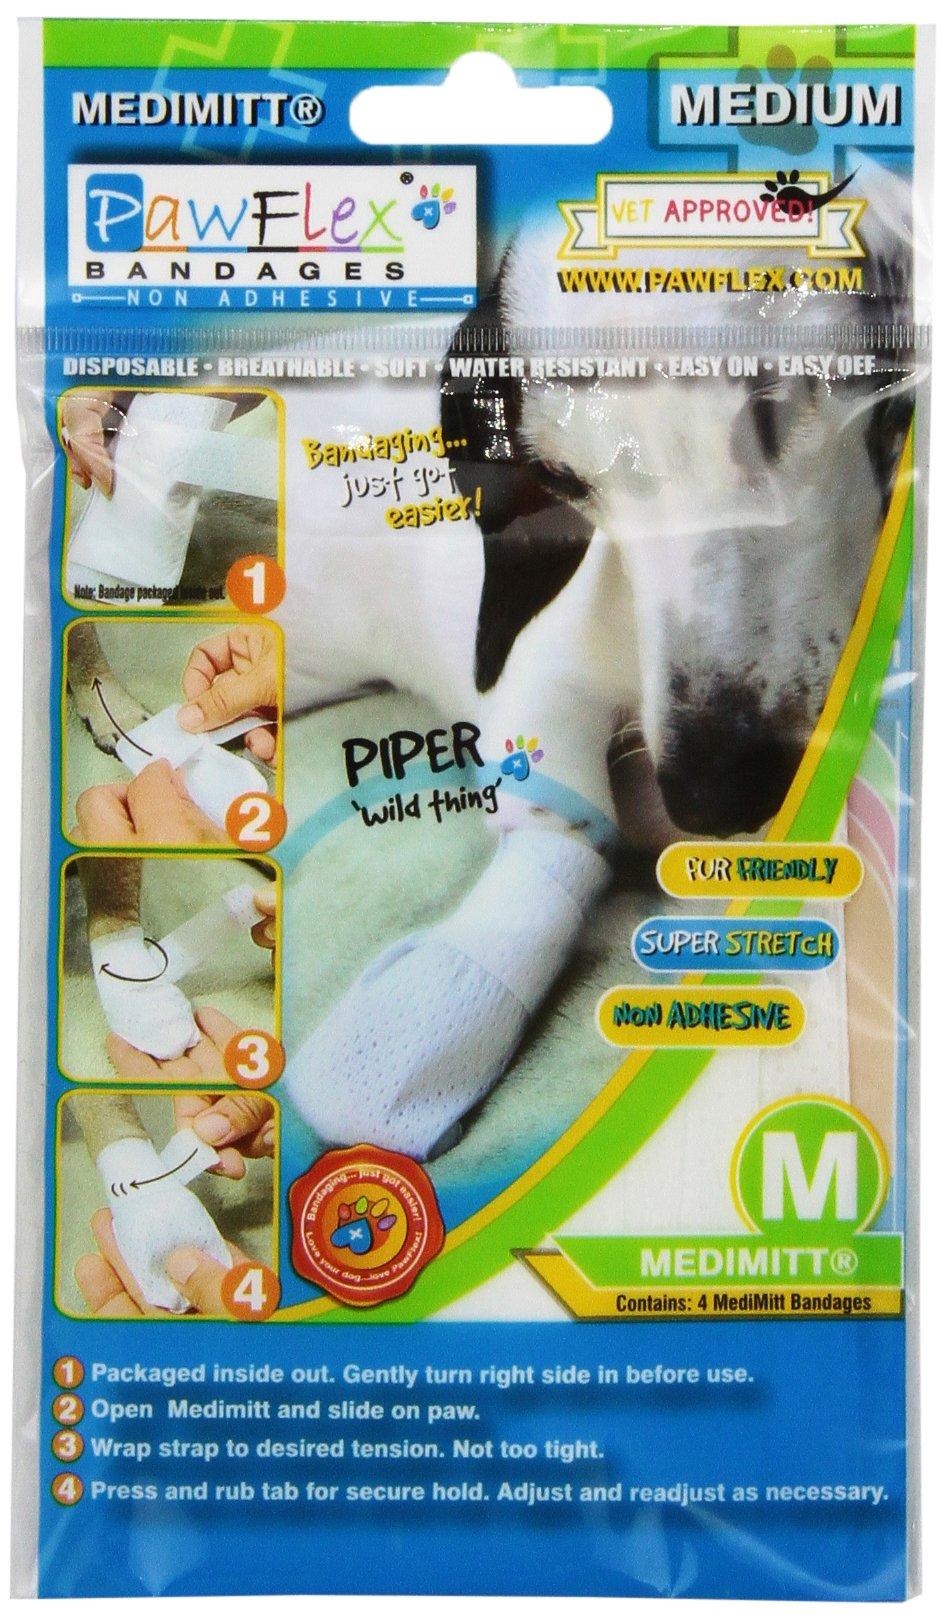 Pawflex Bandages Non-Adhesive Disposable Washable and Reusable Medimitt Banda...